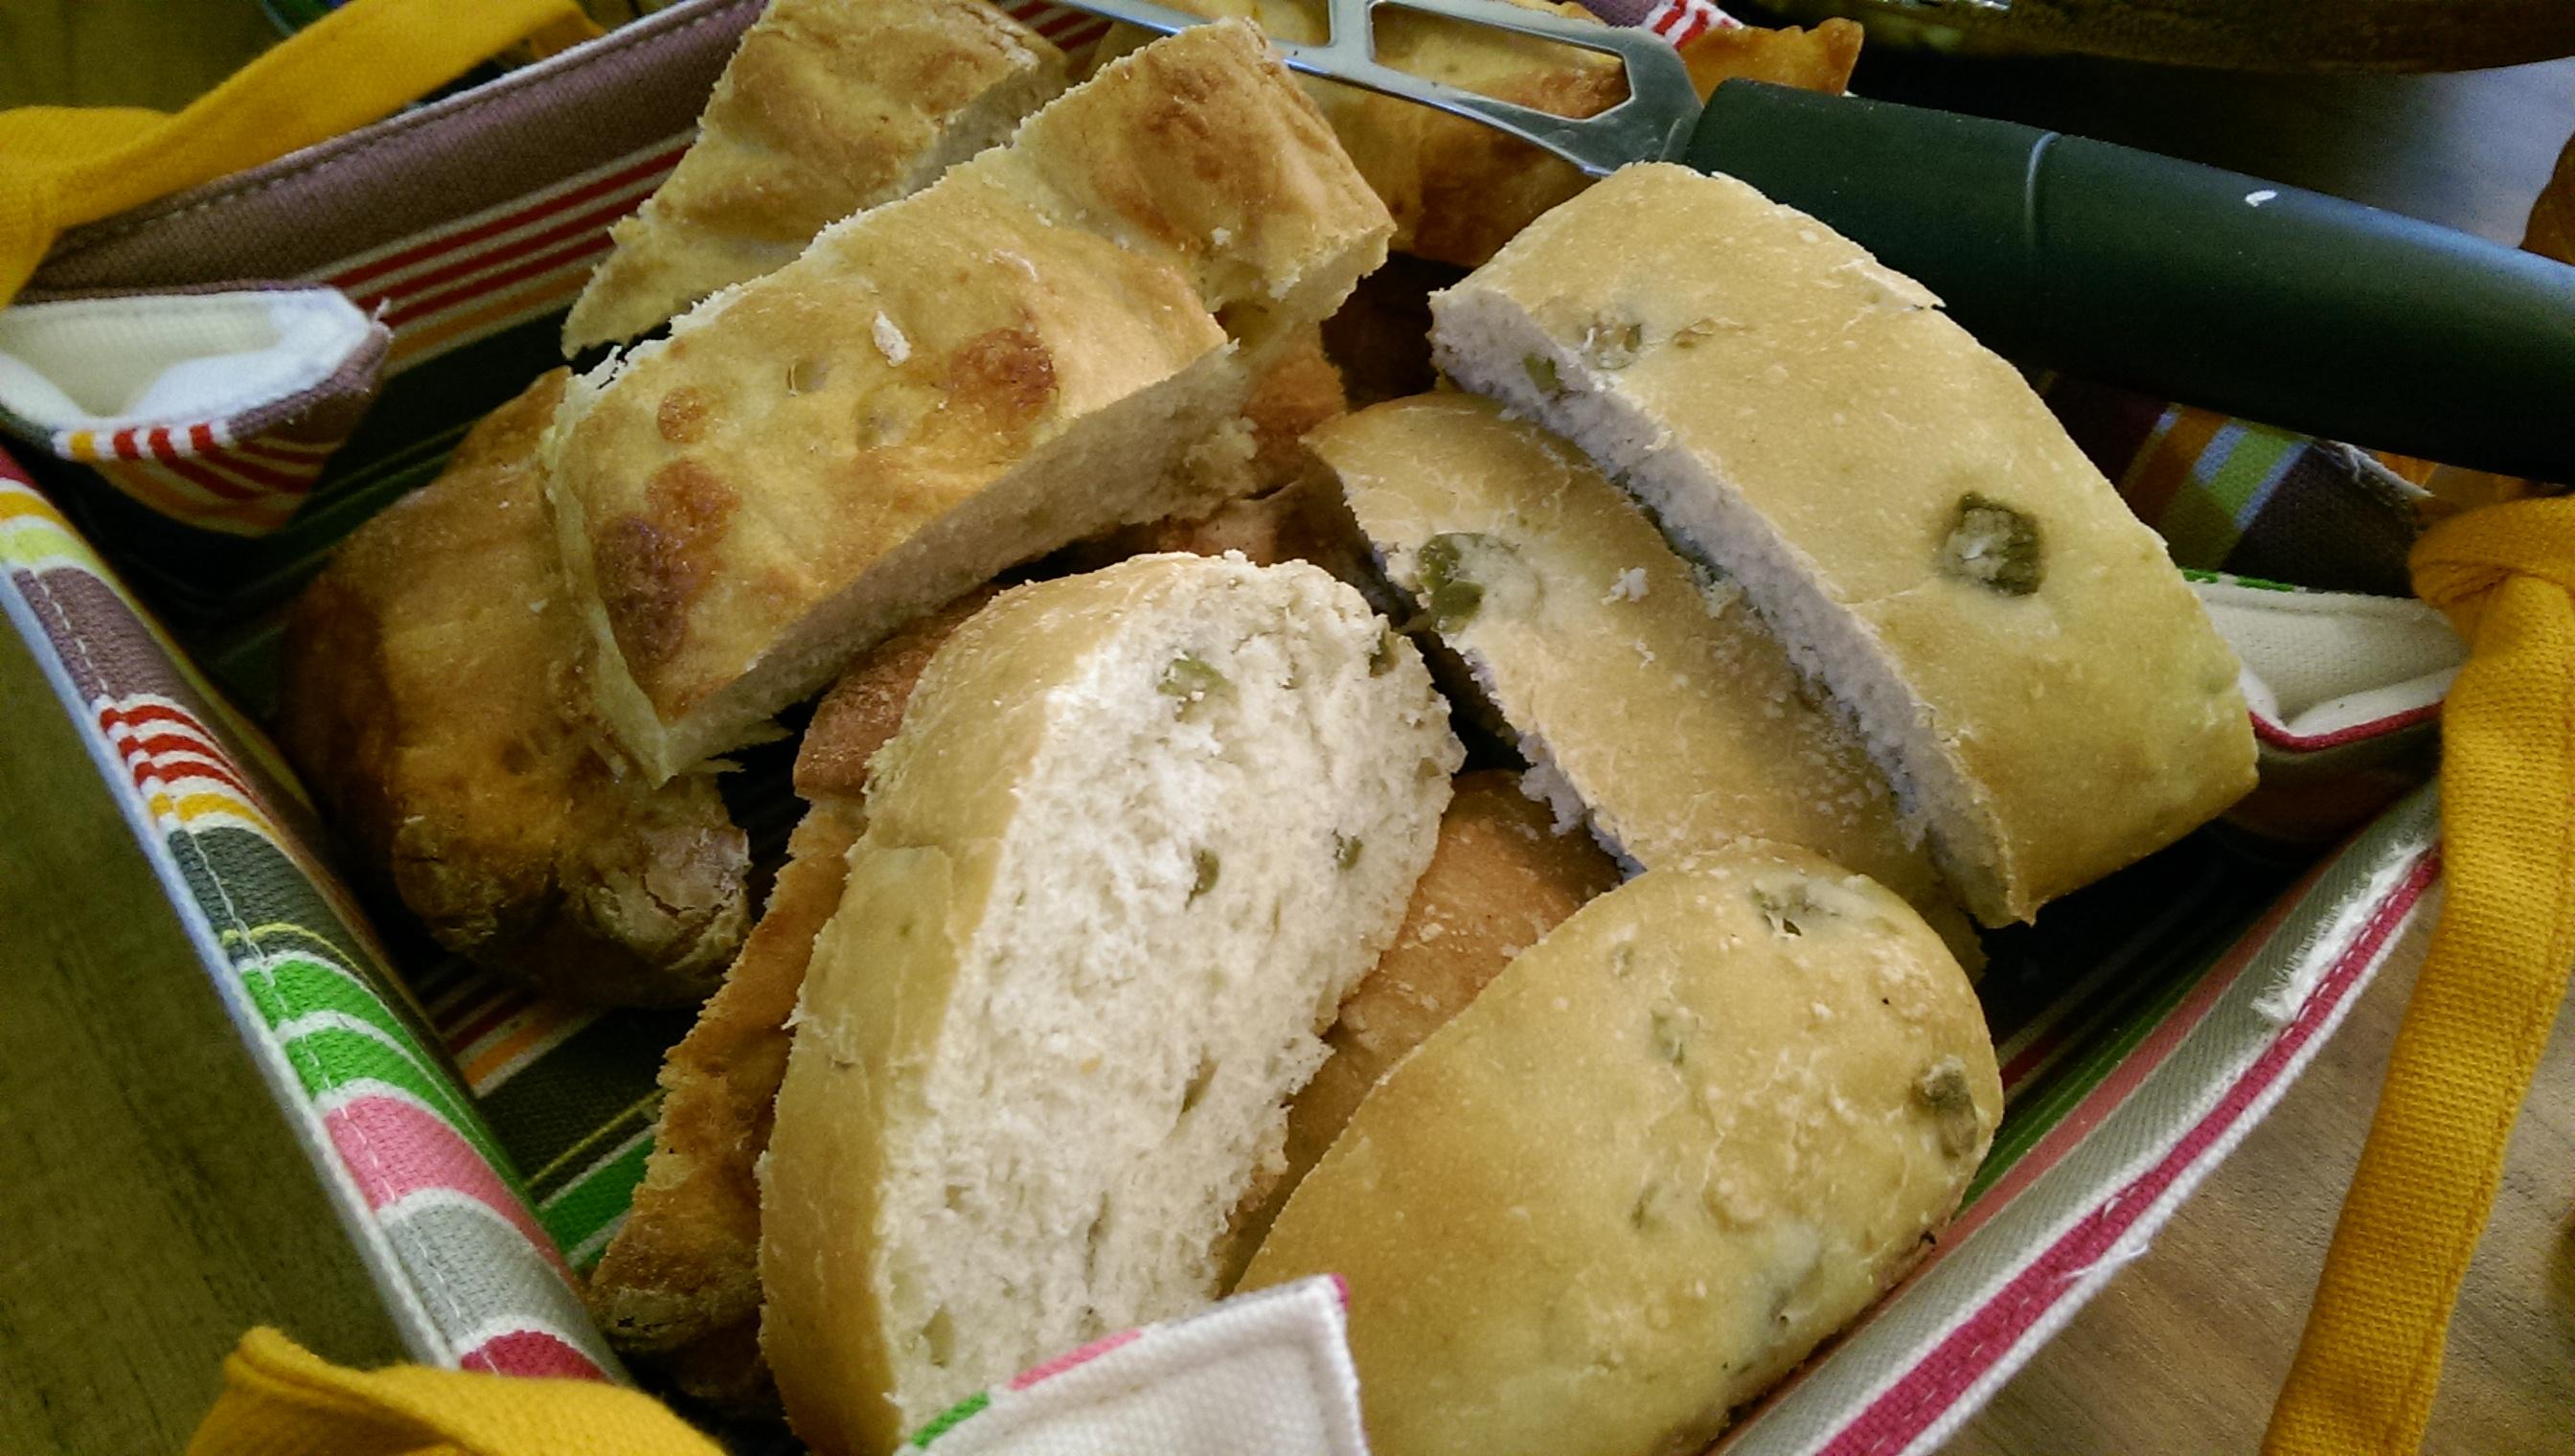 Wholegrain Bread gives you, Energy    نان پر غلات بهتون انرژی میده